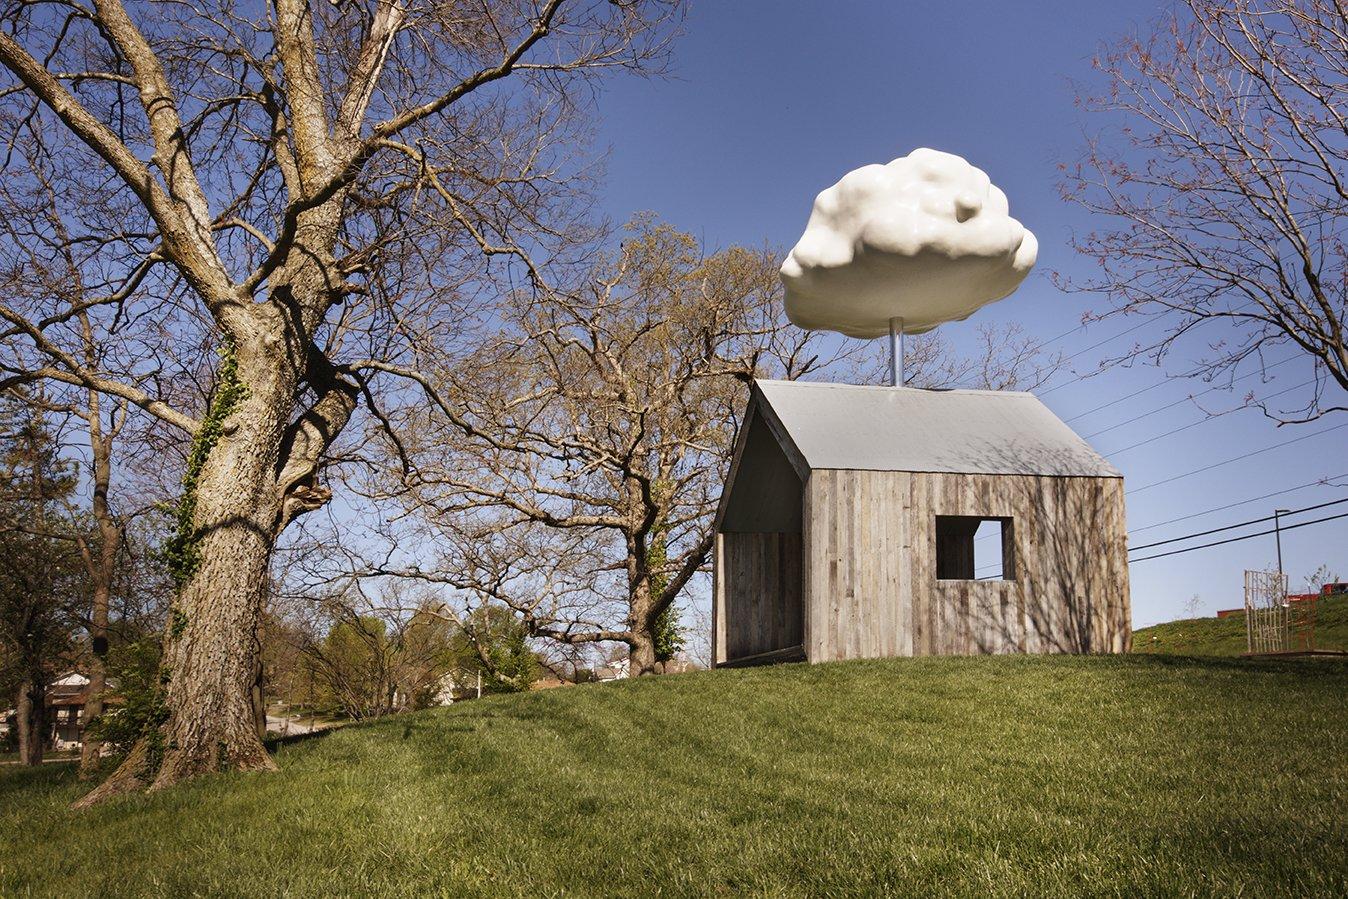 Photo 5 of 5 in Cloud Atlas